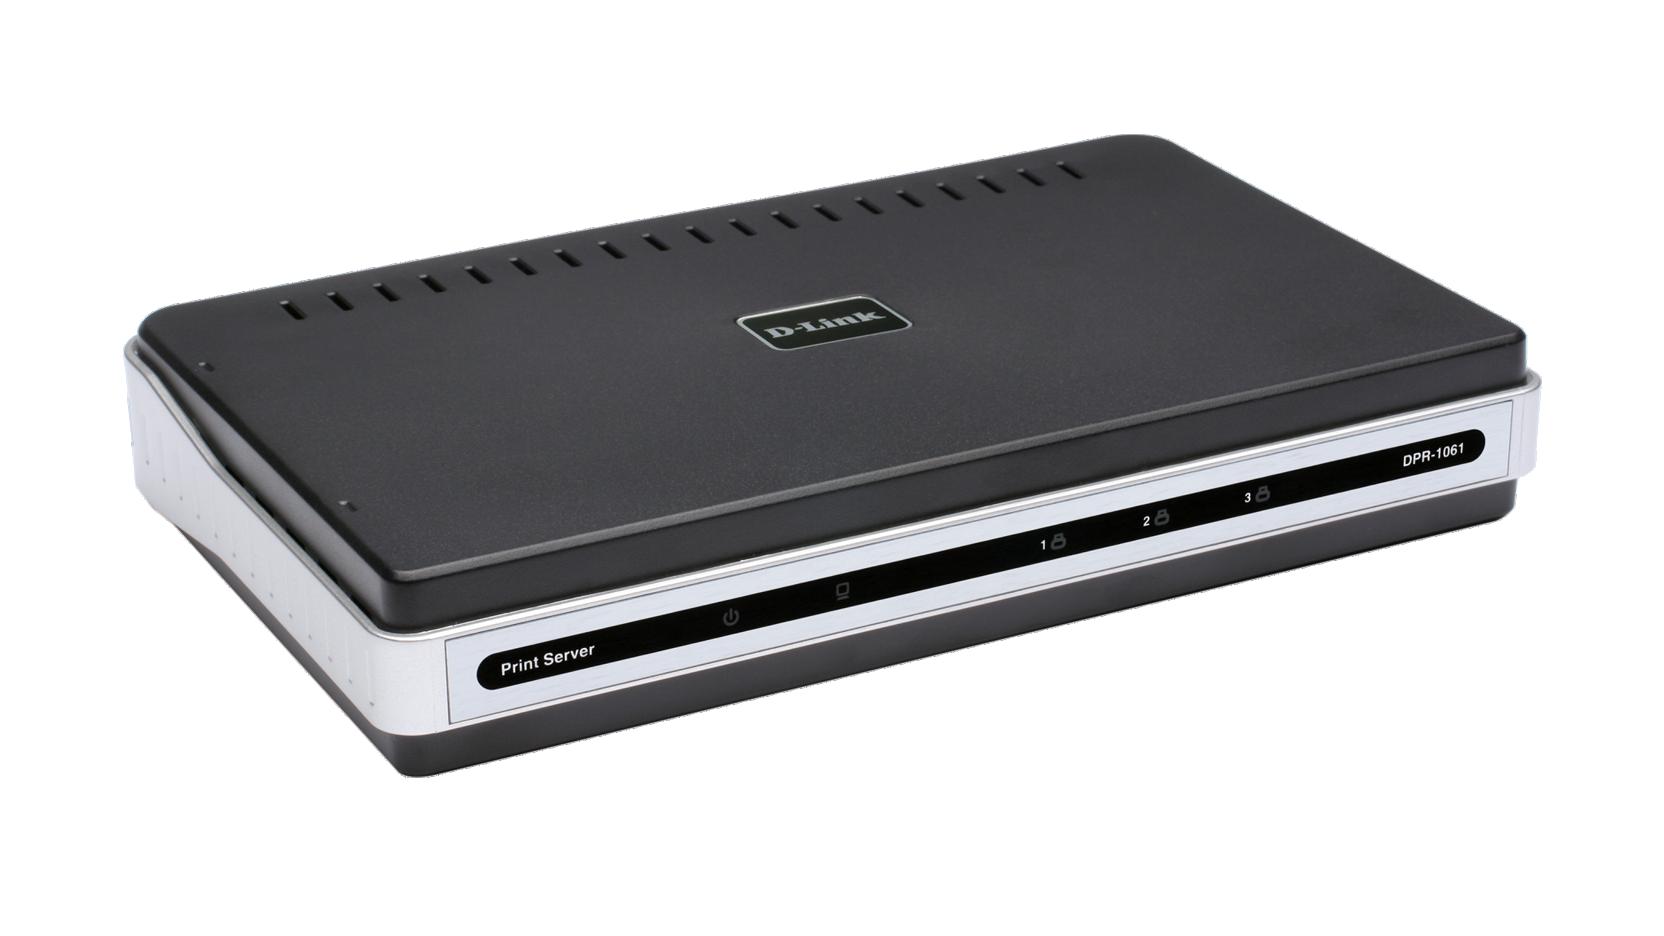 dlink print server dpr-1061 firmware